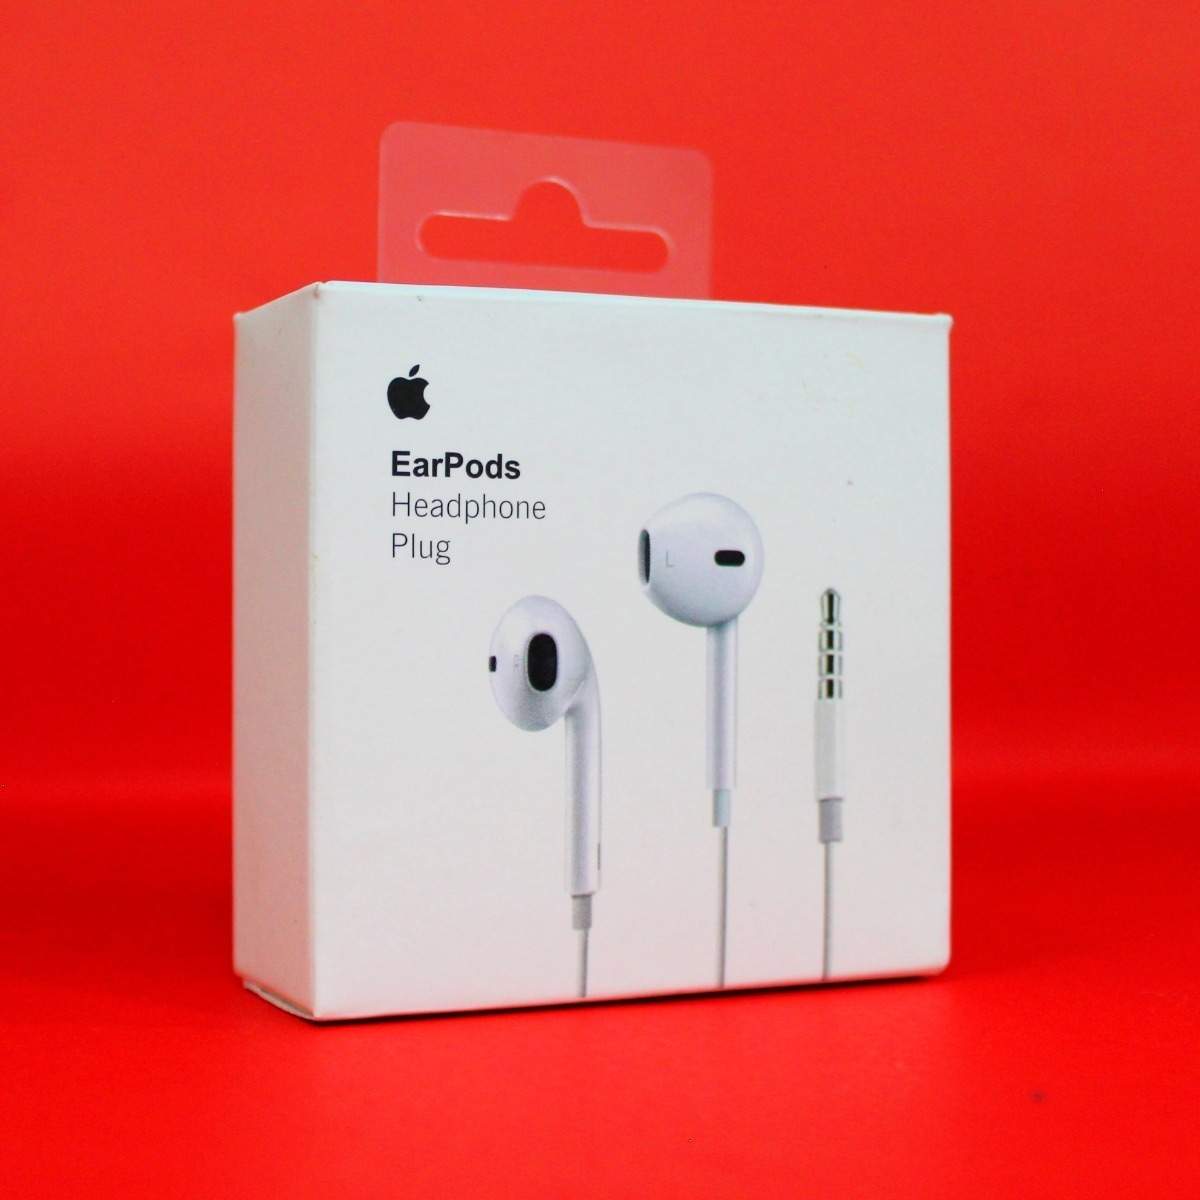 b82047e6e10 audifonos earpods apple iphone 5, 5s, 6, 6s original sellado. Cargando zoom.